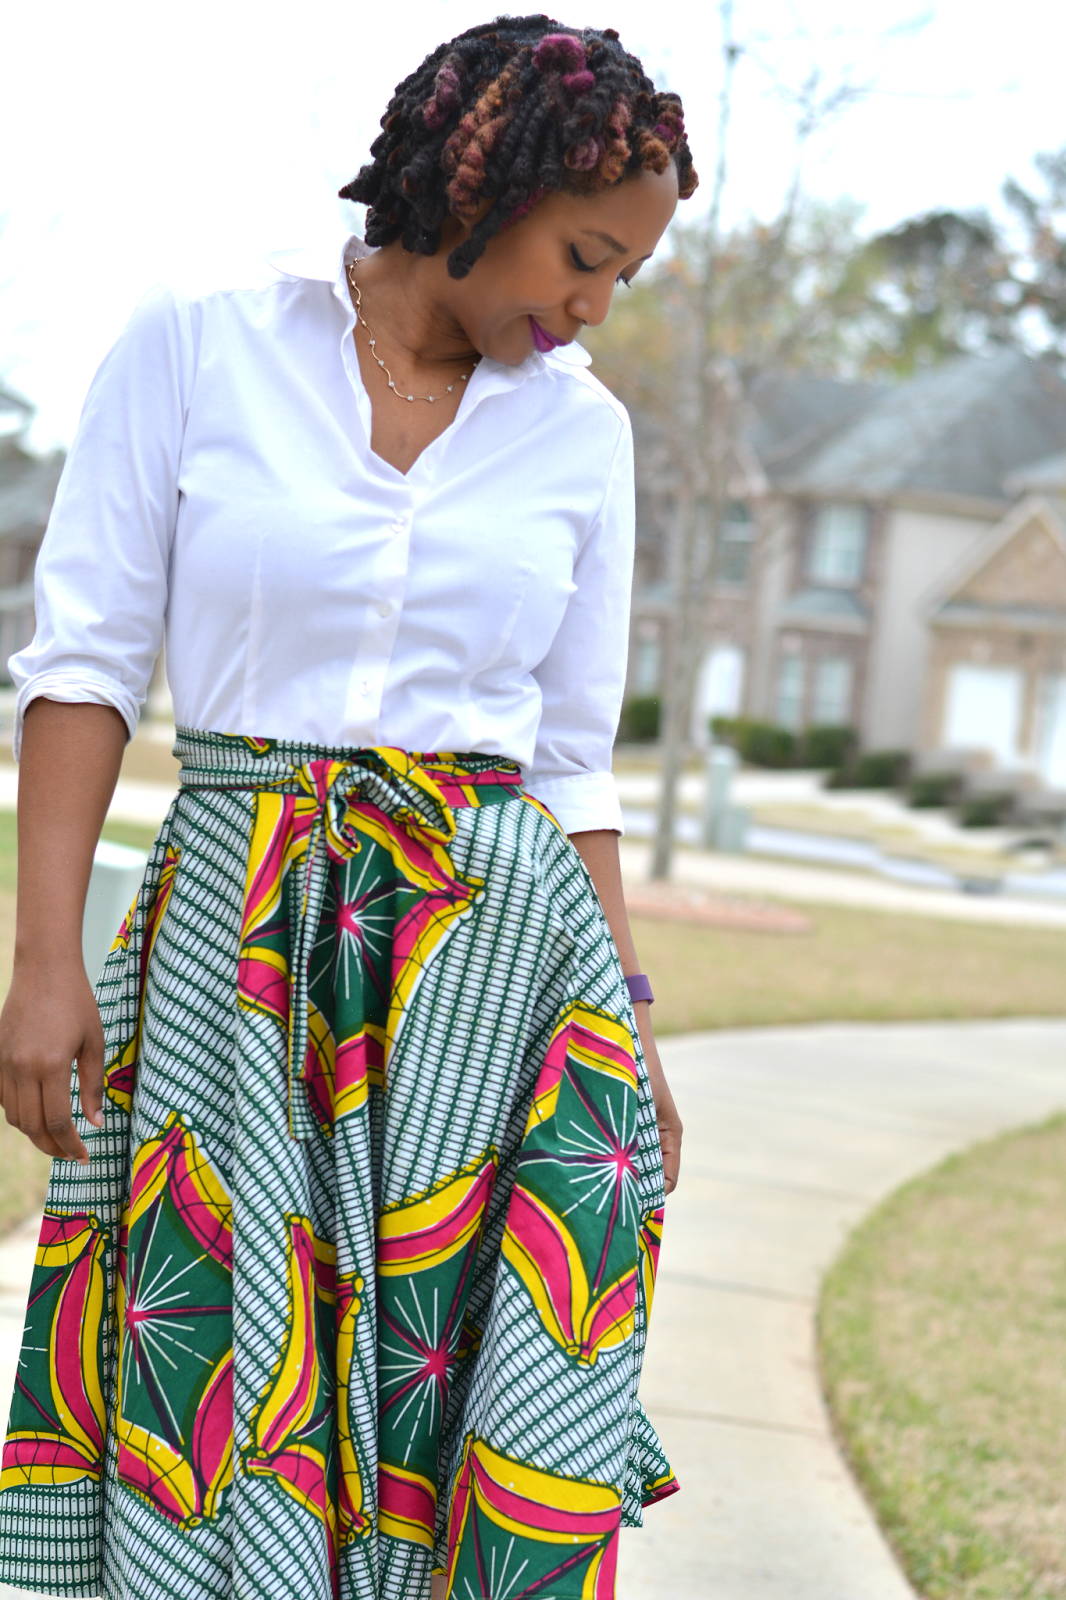 Diy african print skirt african print skirt fashion sewing and diy african print skirt made with mccalls 4875 very easy to sew full skirt pattern jeuxipadfo Gallery